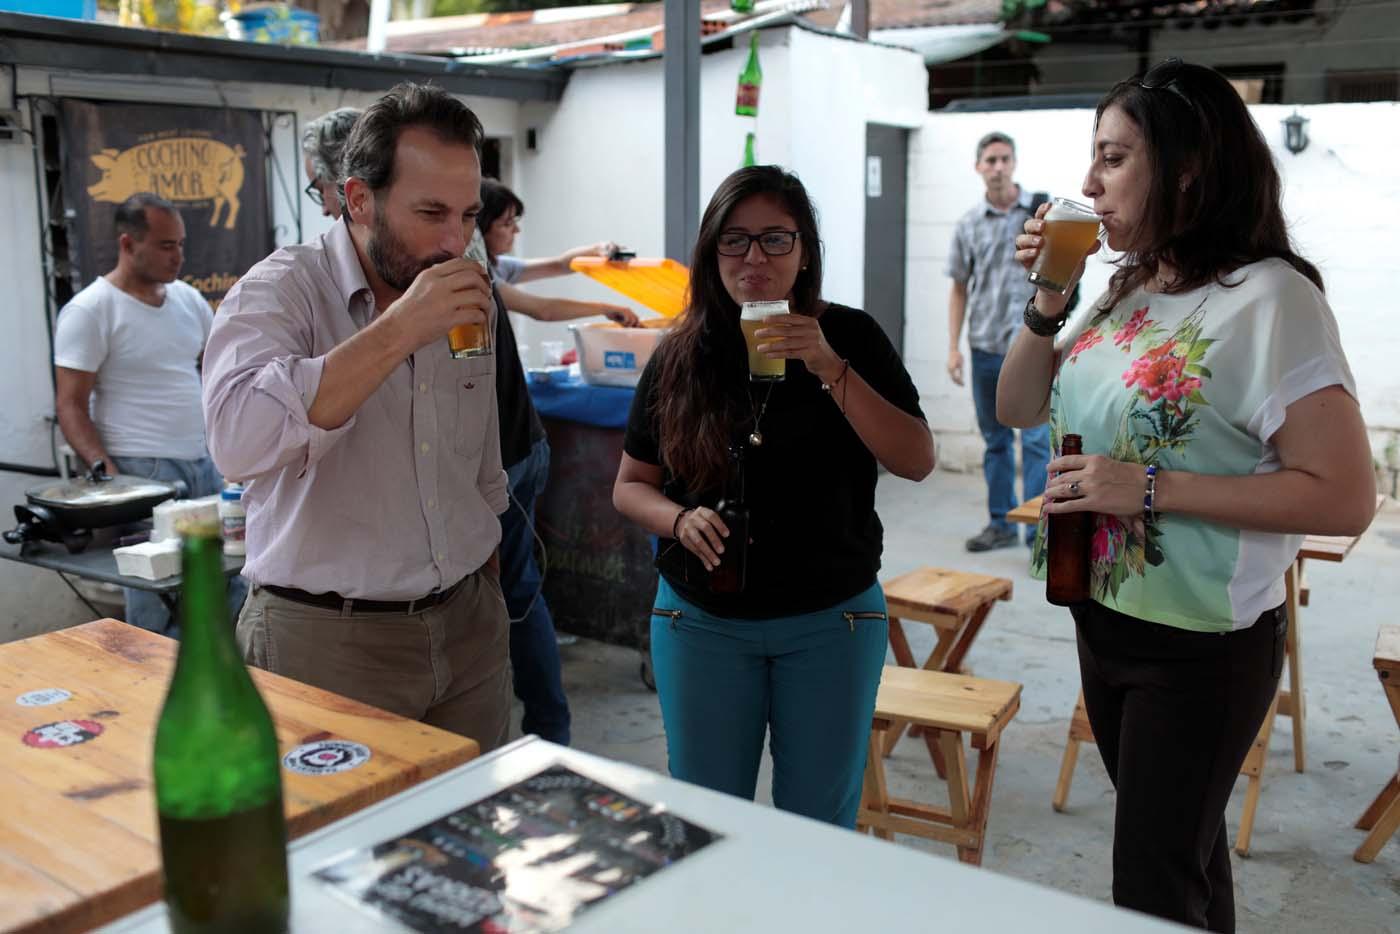 People drink craft beer in a beer garden at the garage of Social Club brewery in Caracas, Venezuela, September 15, 2017. Picture taken September 15, 2017. REUTERS/Marco Bello